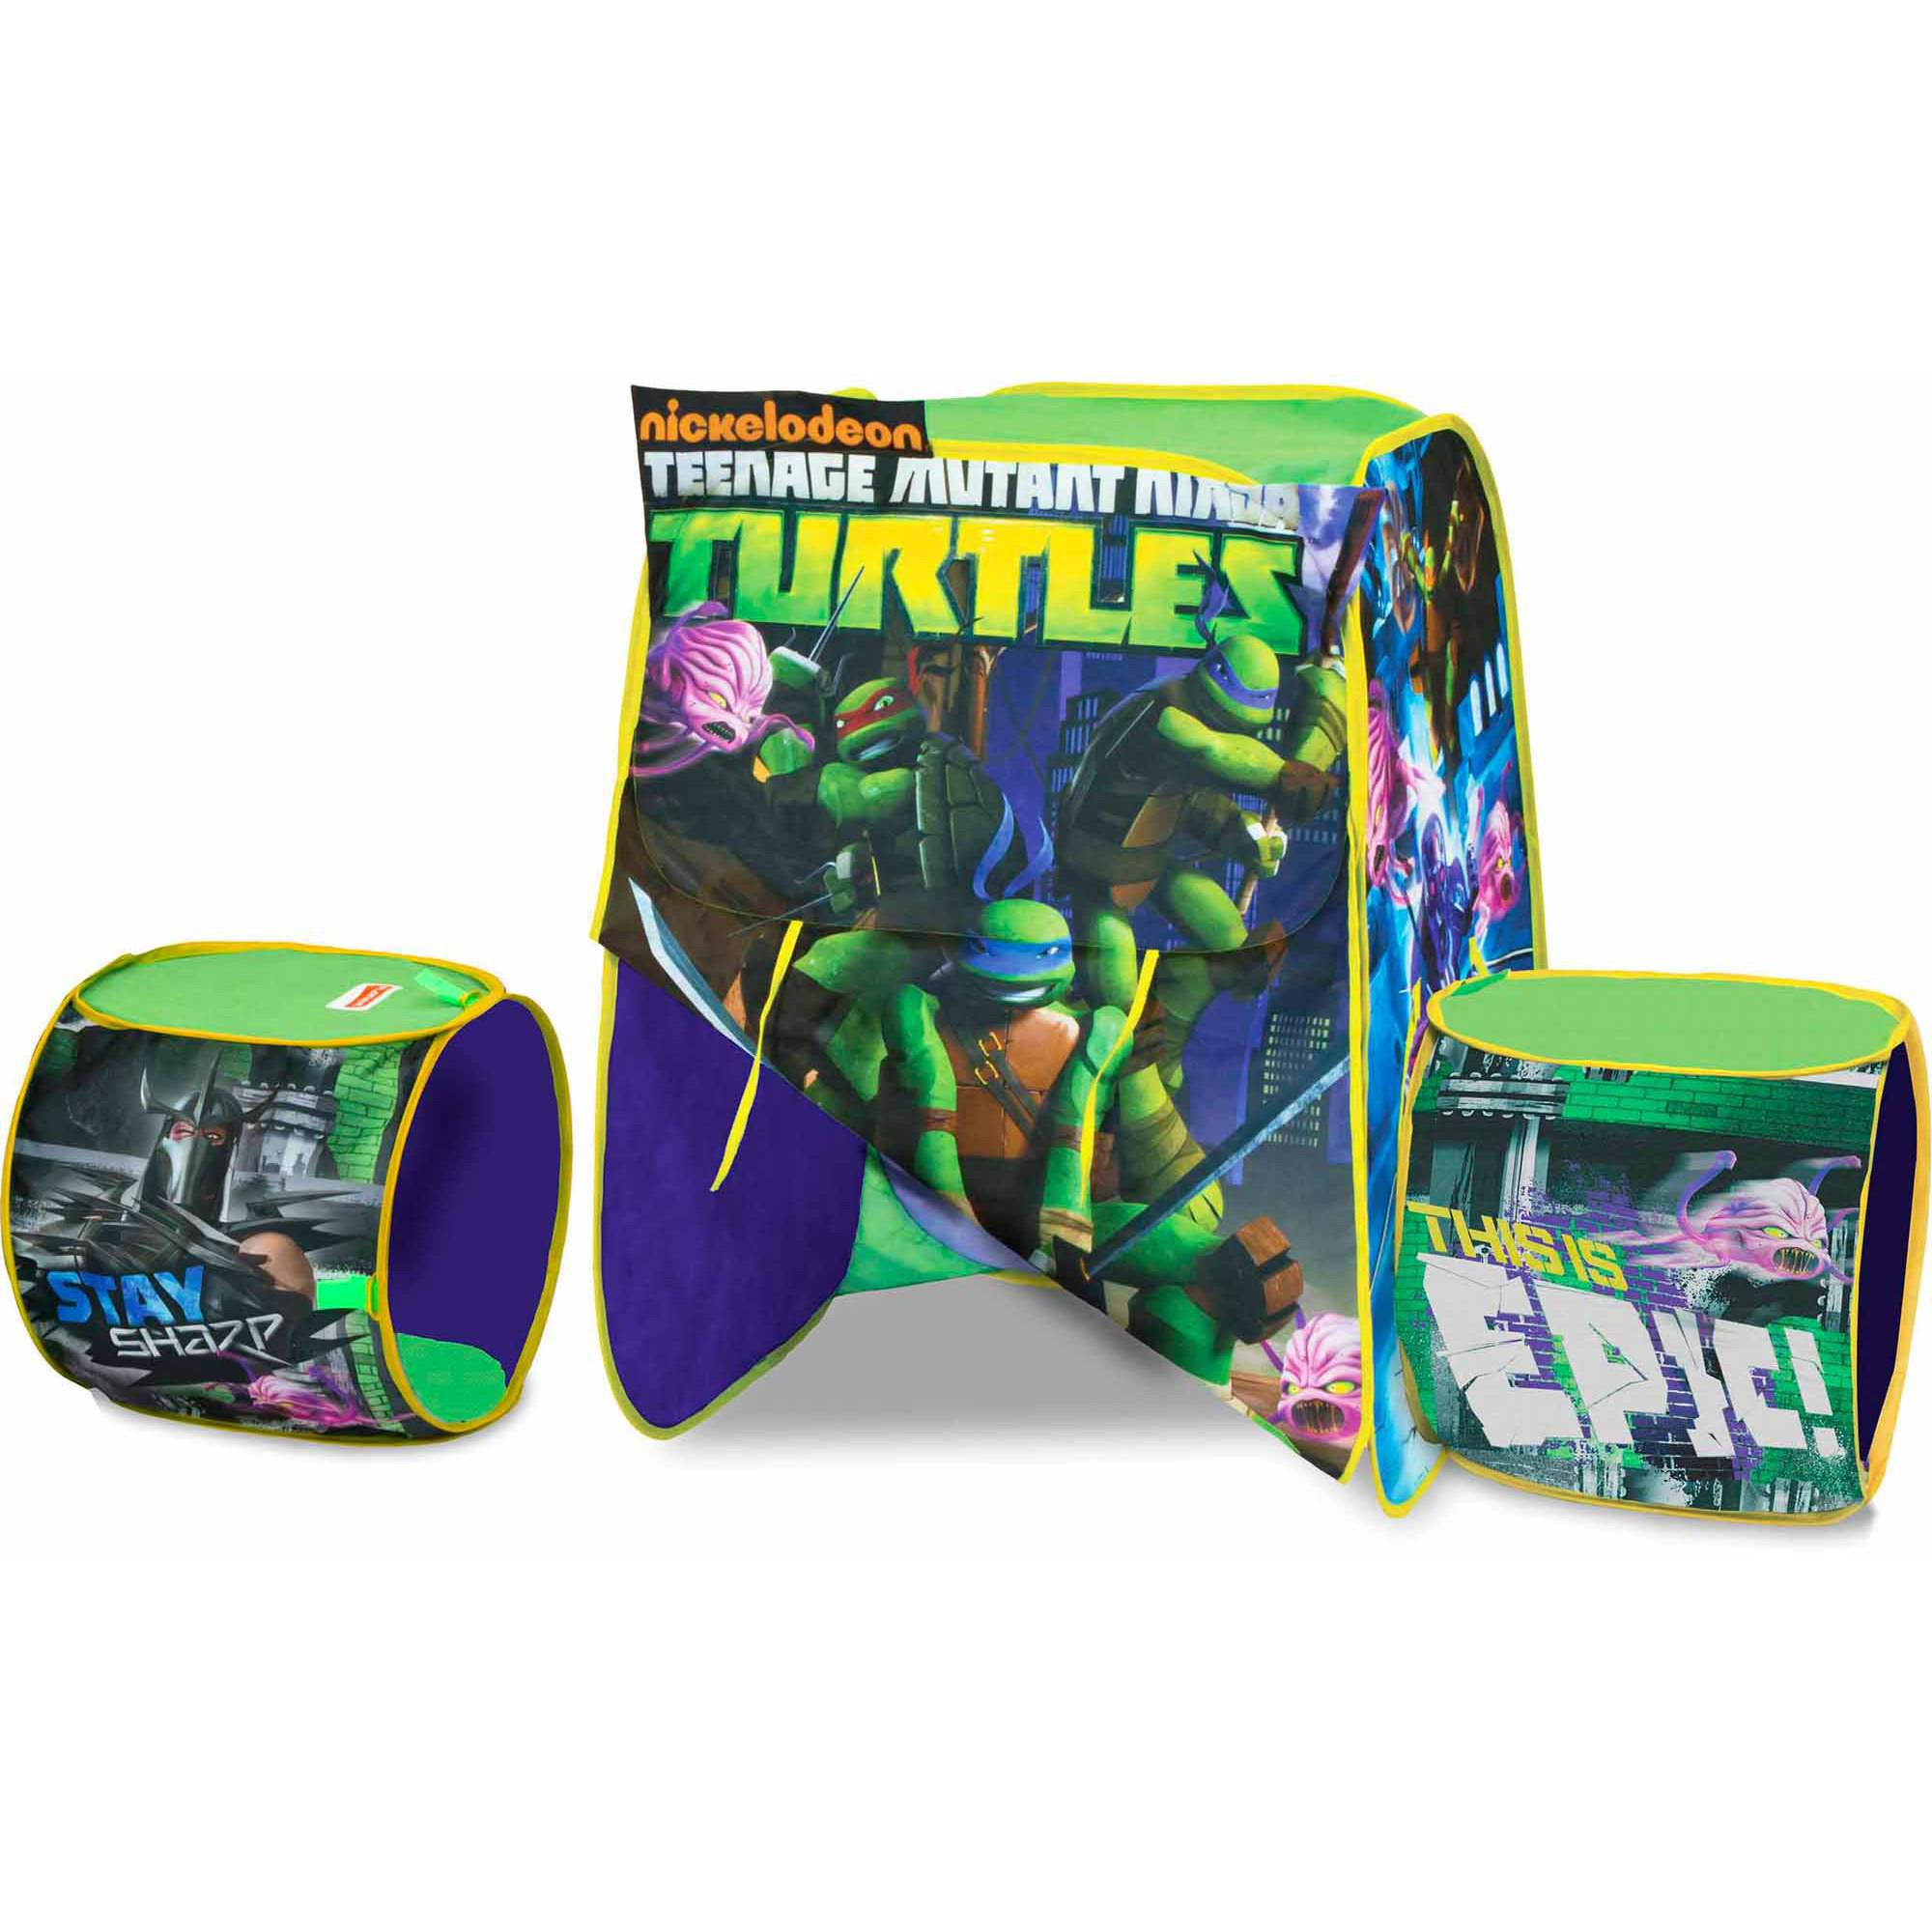 Playhut Nickelodeon Teenage Mutant Ninja Turtles New Adventure Play Tent